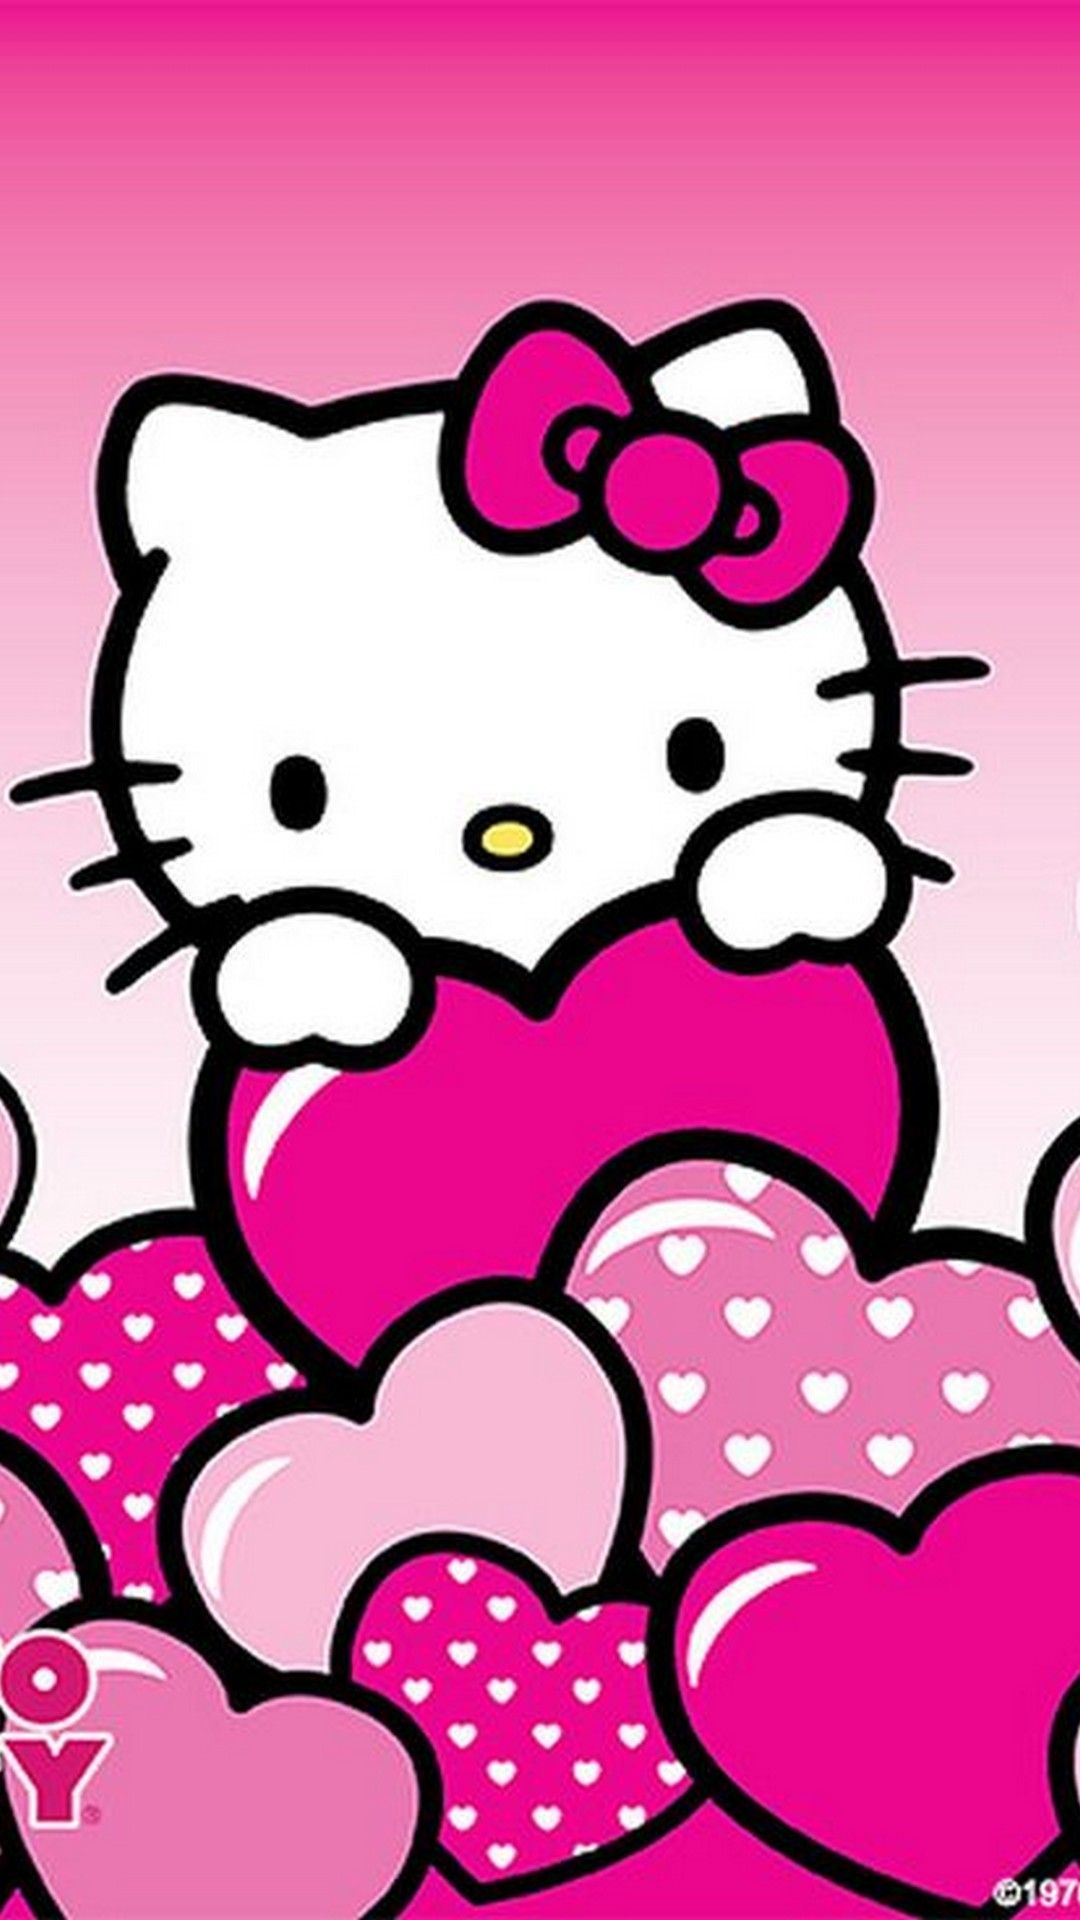 Wallpaper Iphone Hello Kitty 2019 3d Iphone Wallpaper Regarding